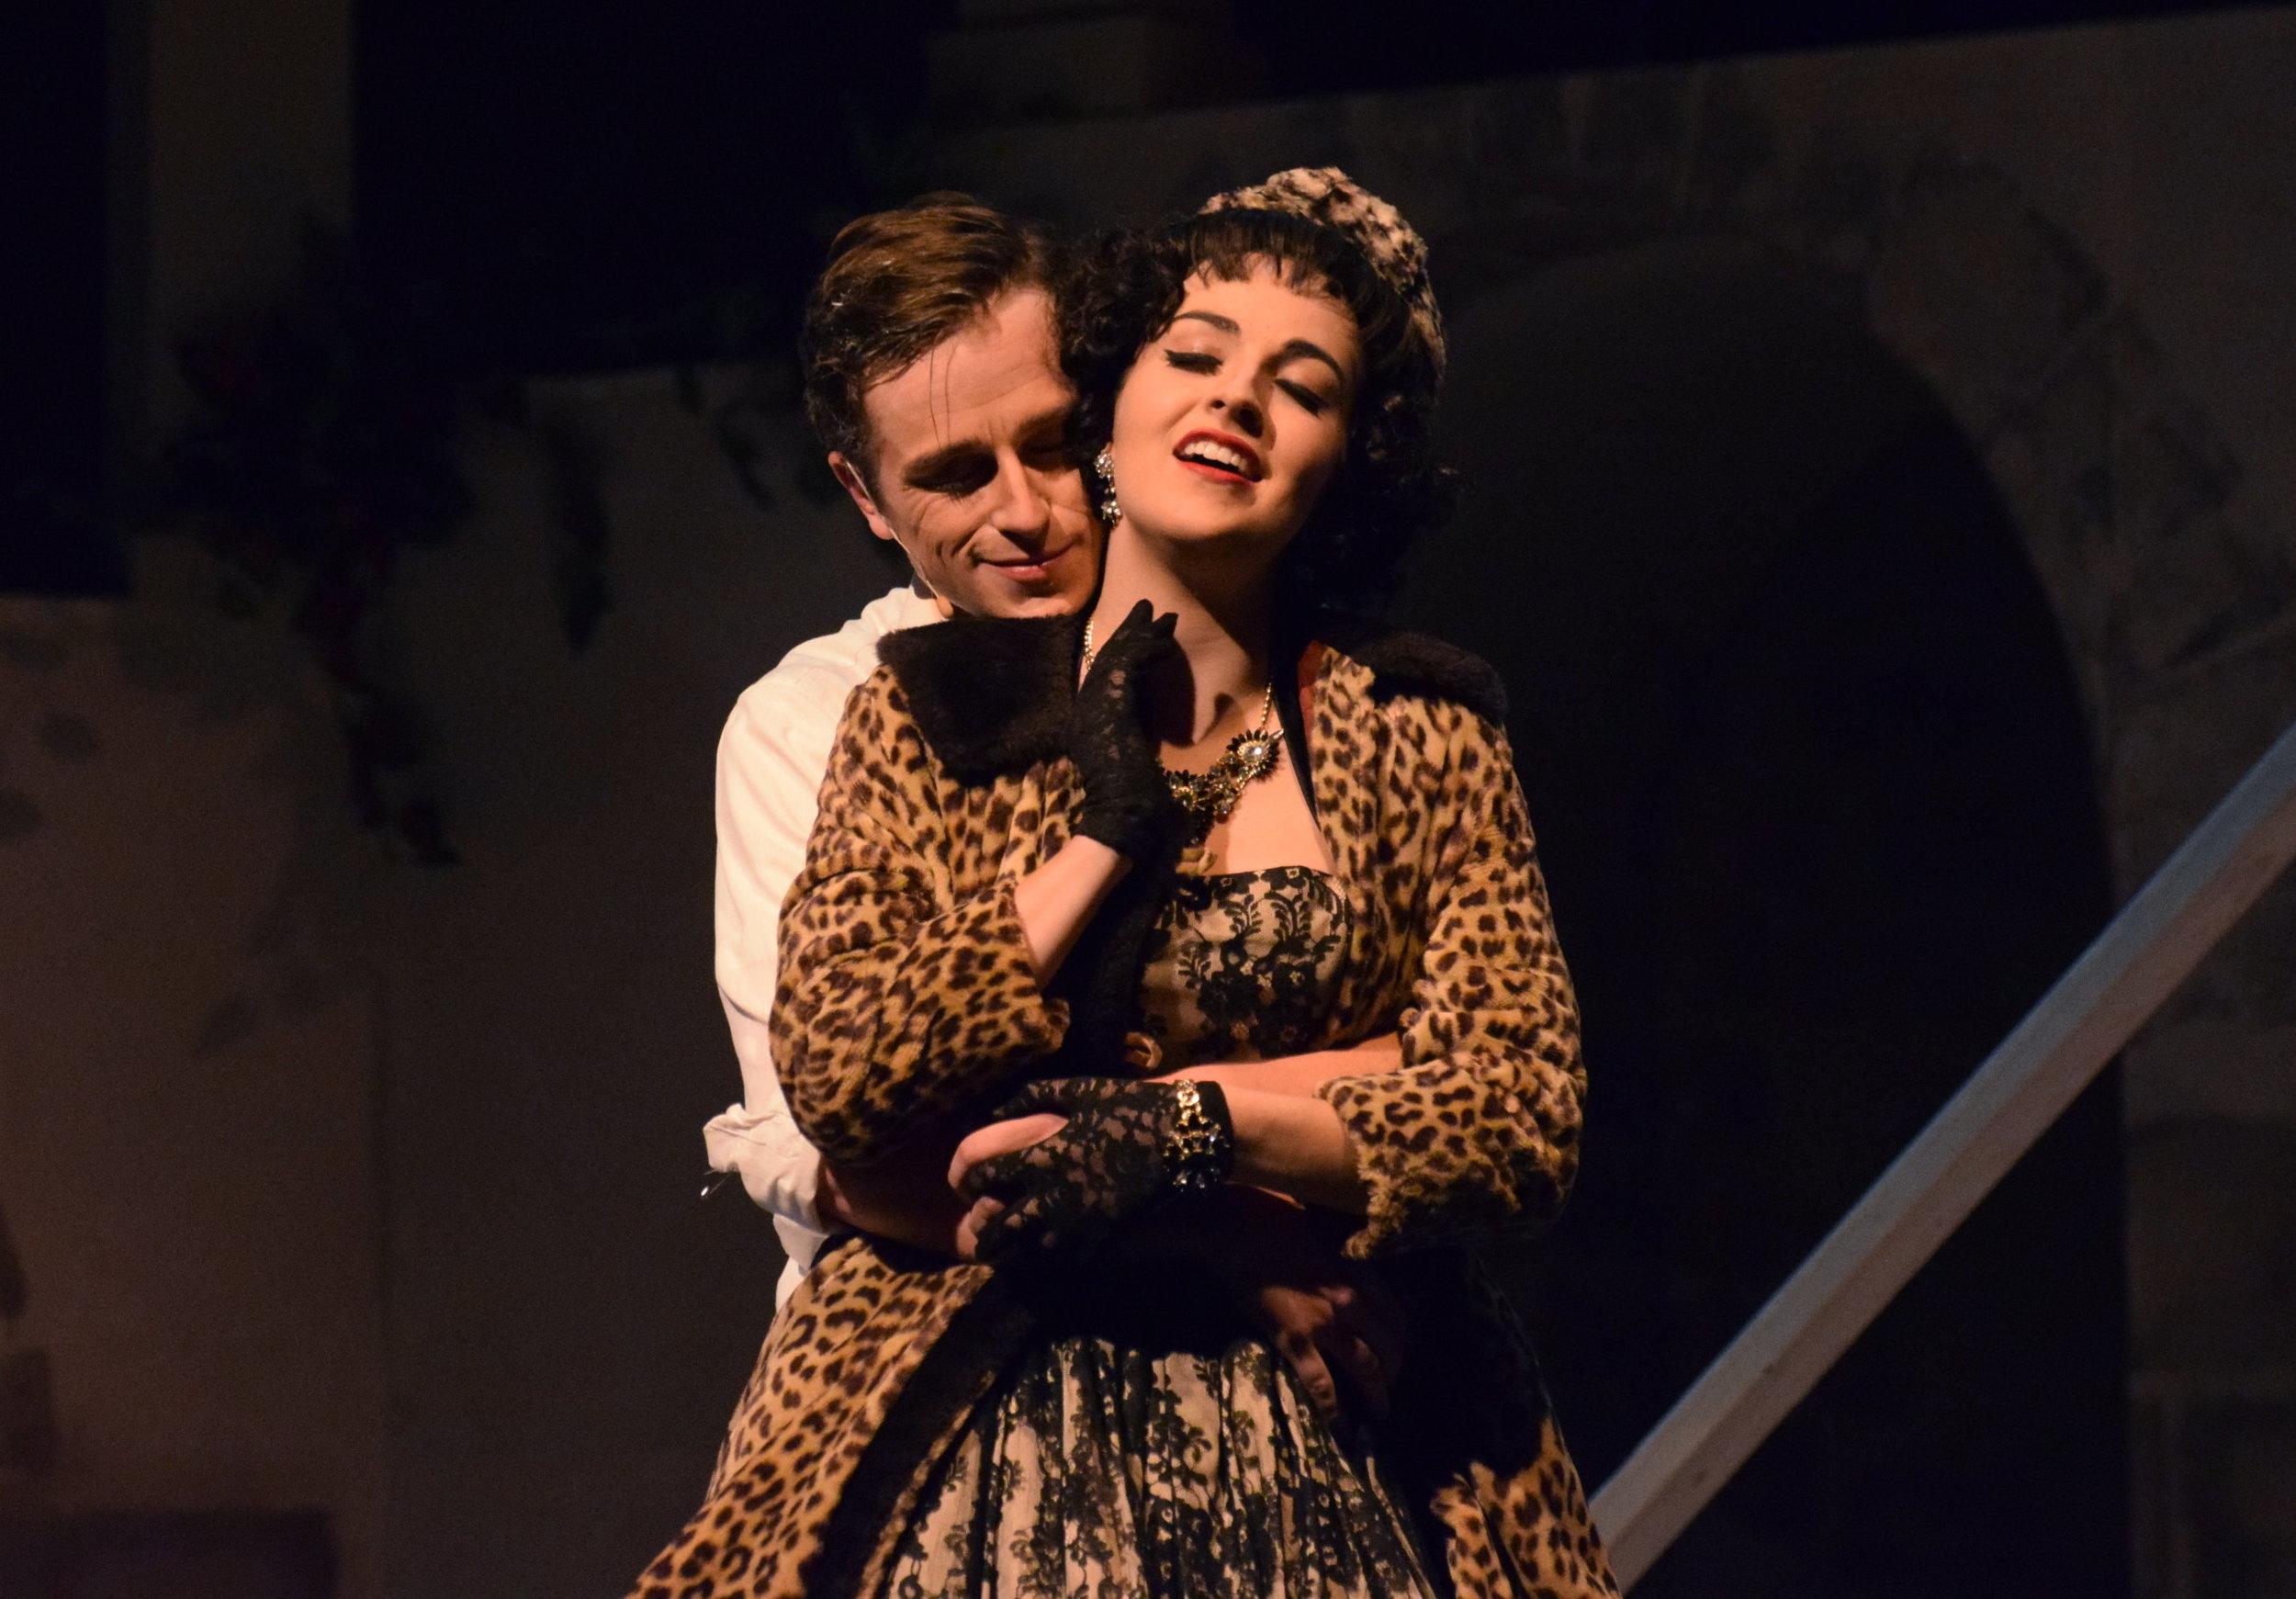 Guido clings to Carla as she says goodbye.